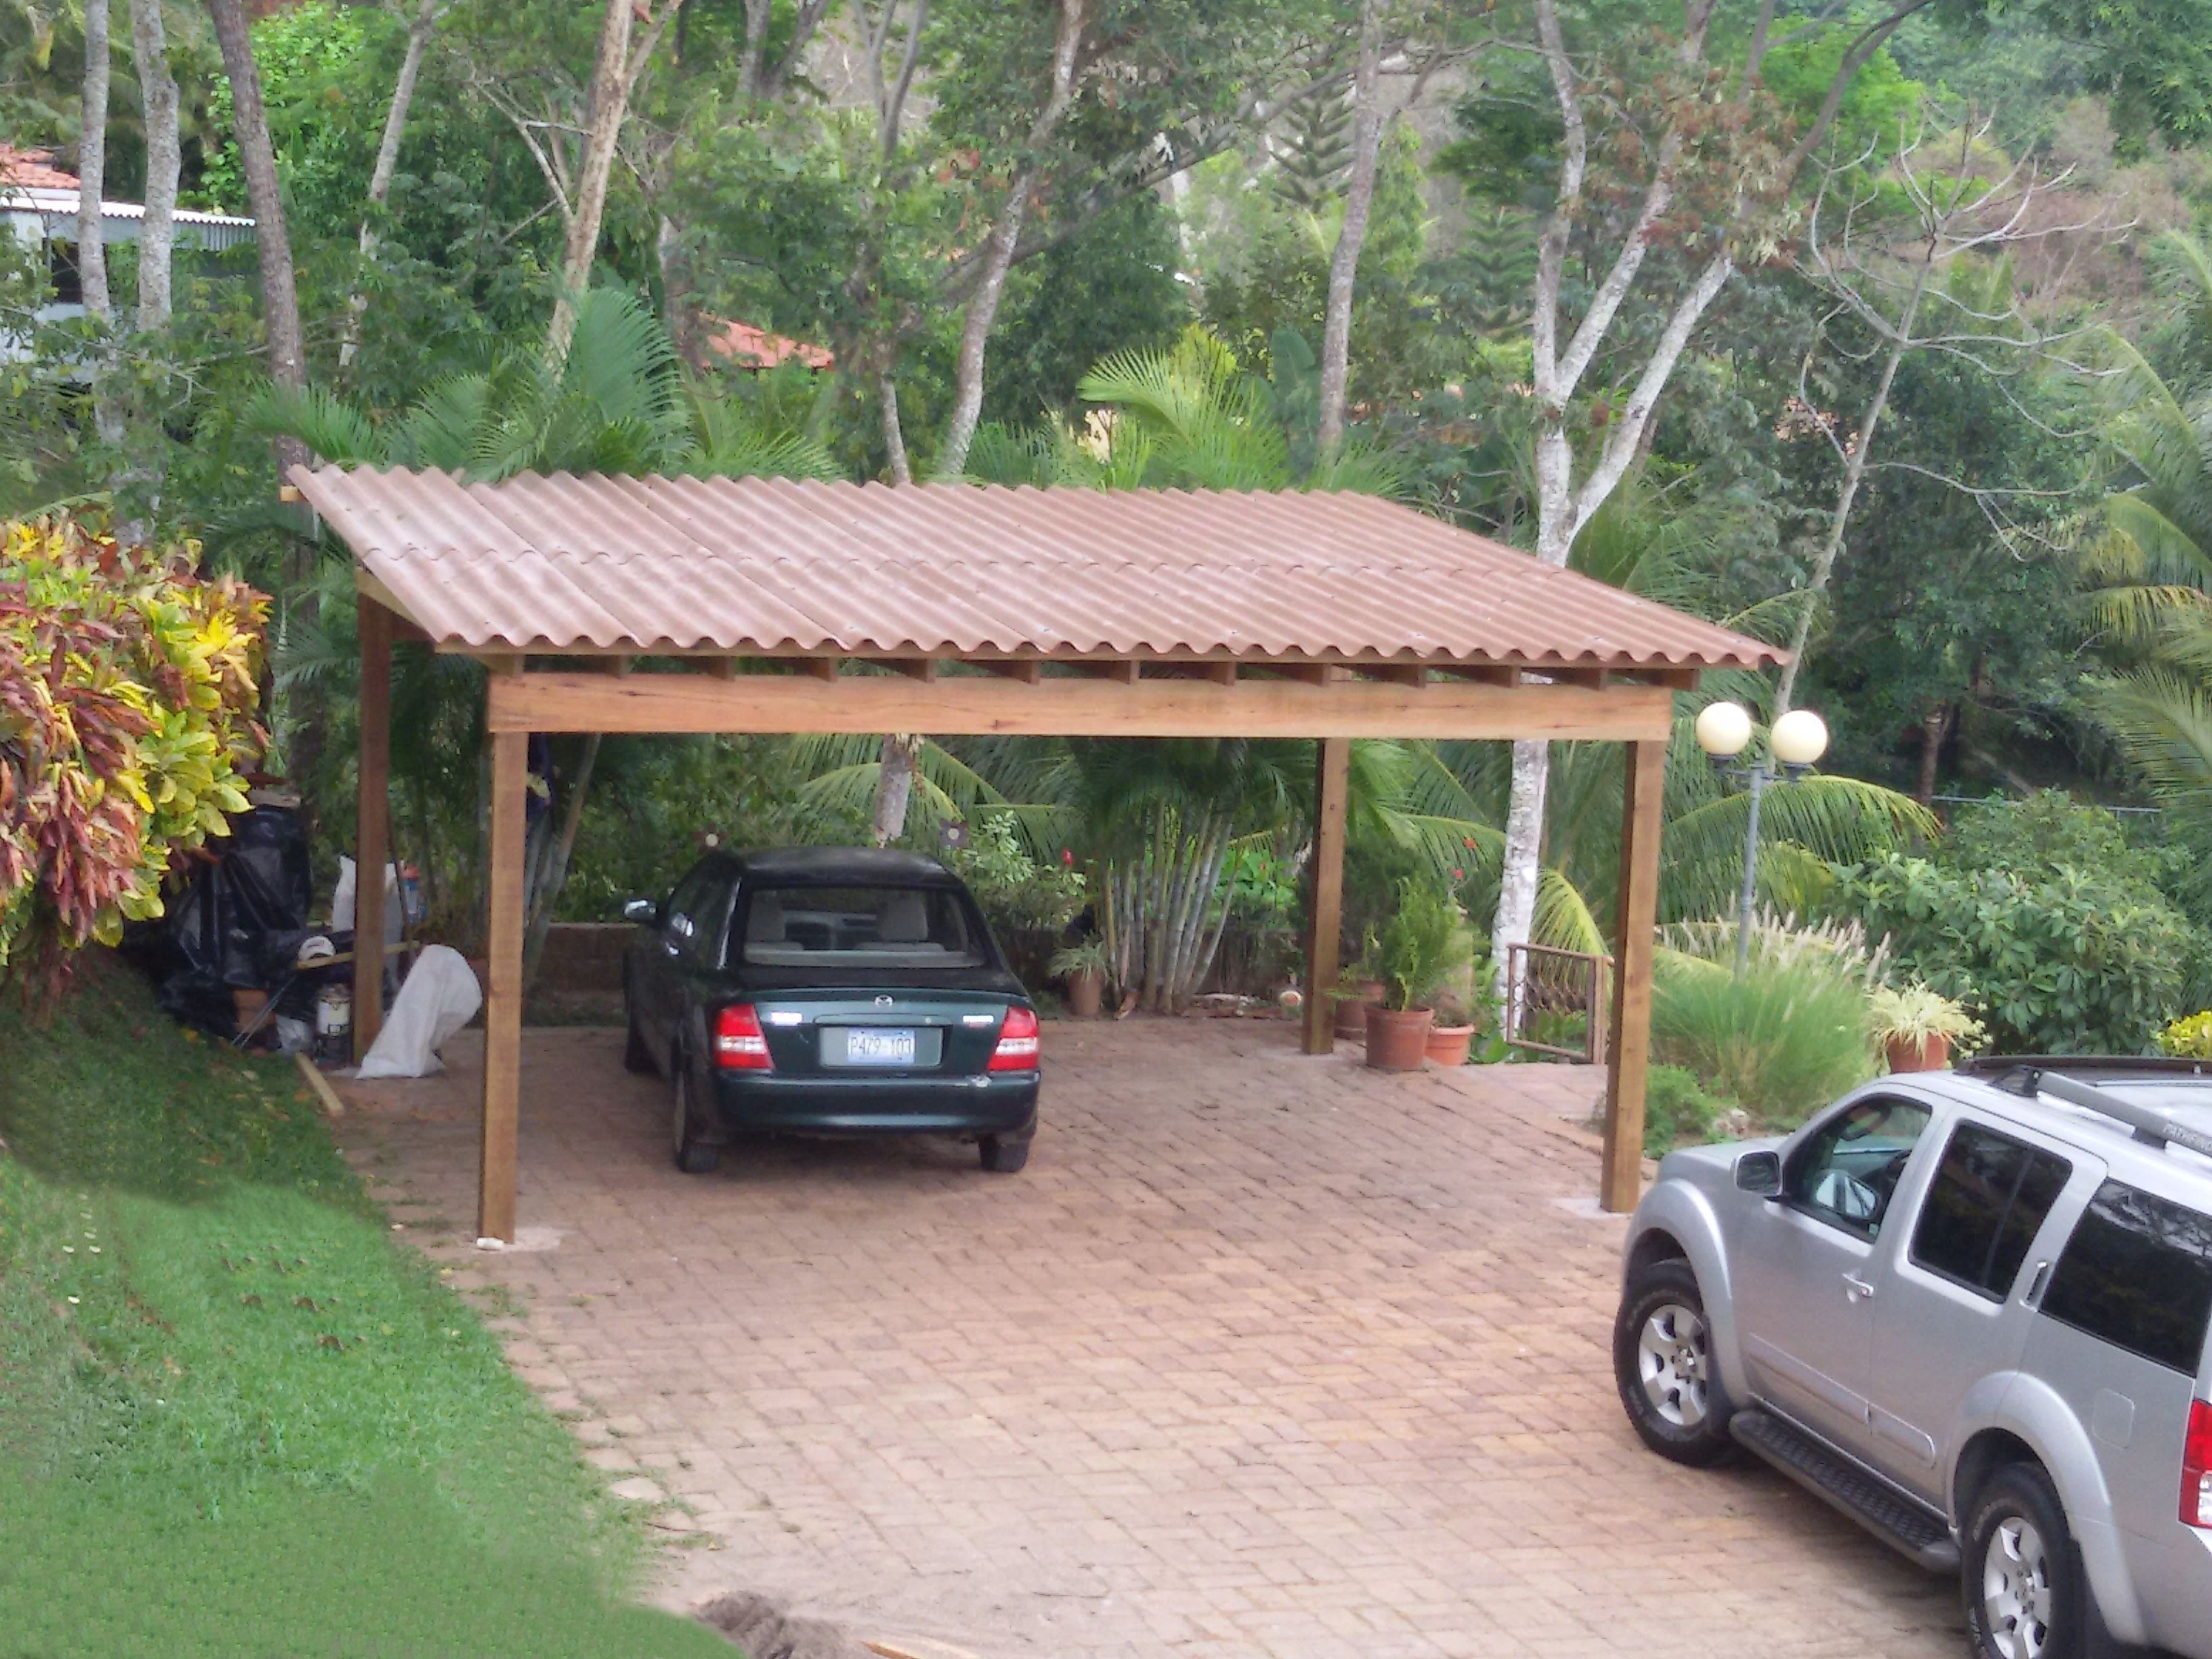 Pergolas de madera rustica buscar con google casa for Terrazas rusticas techadas